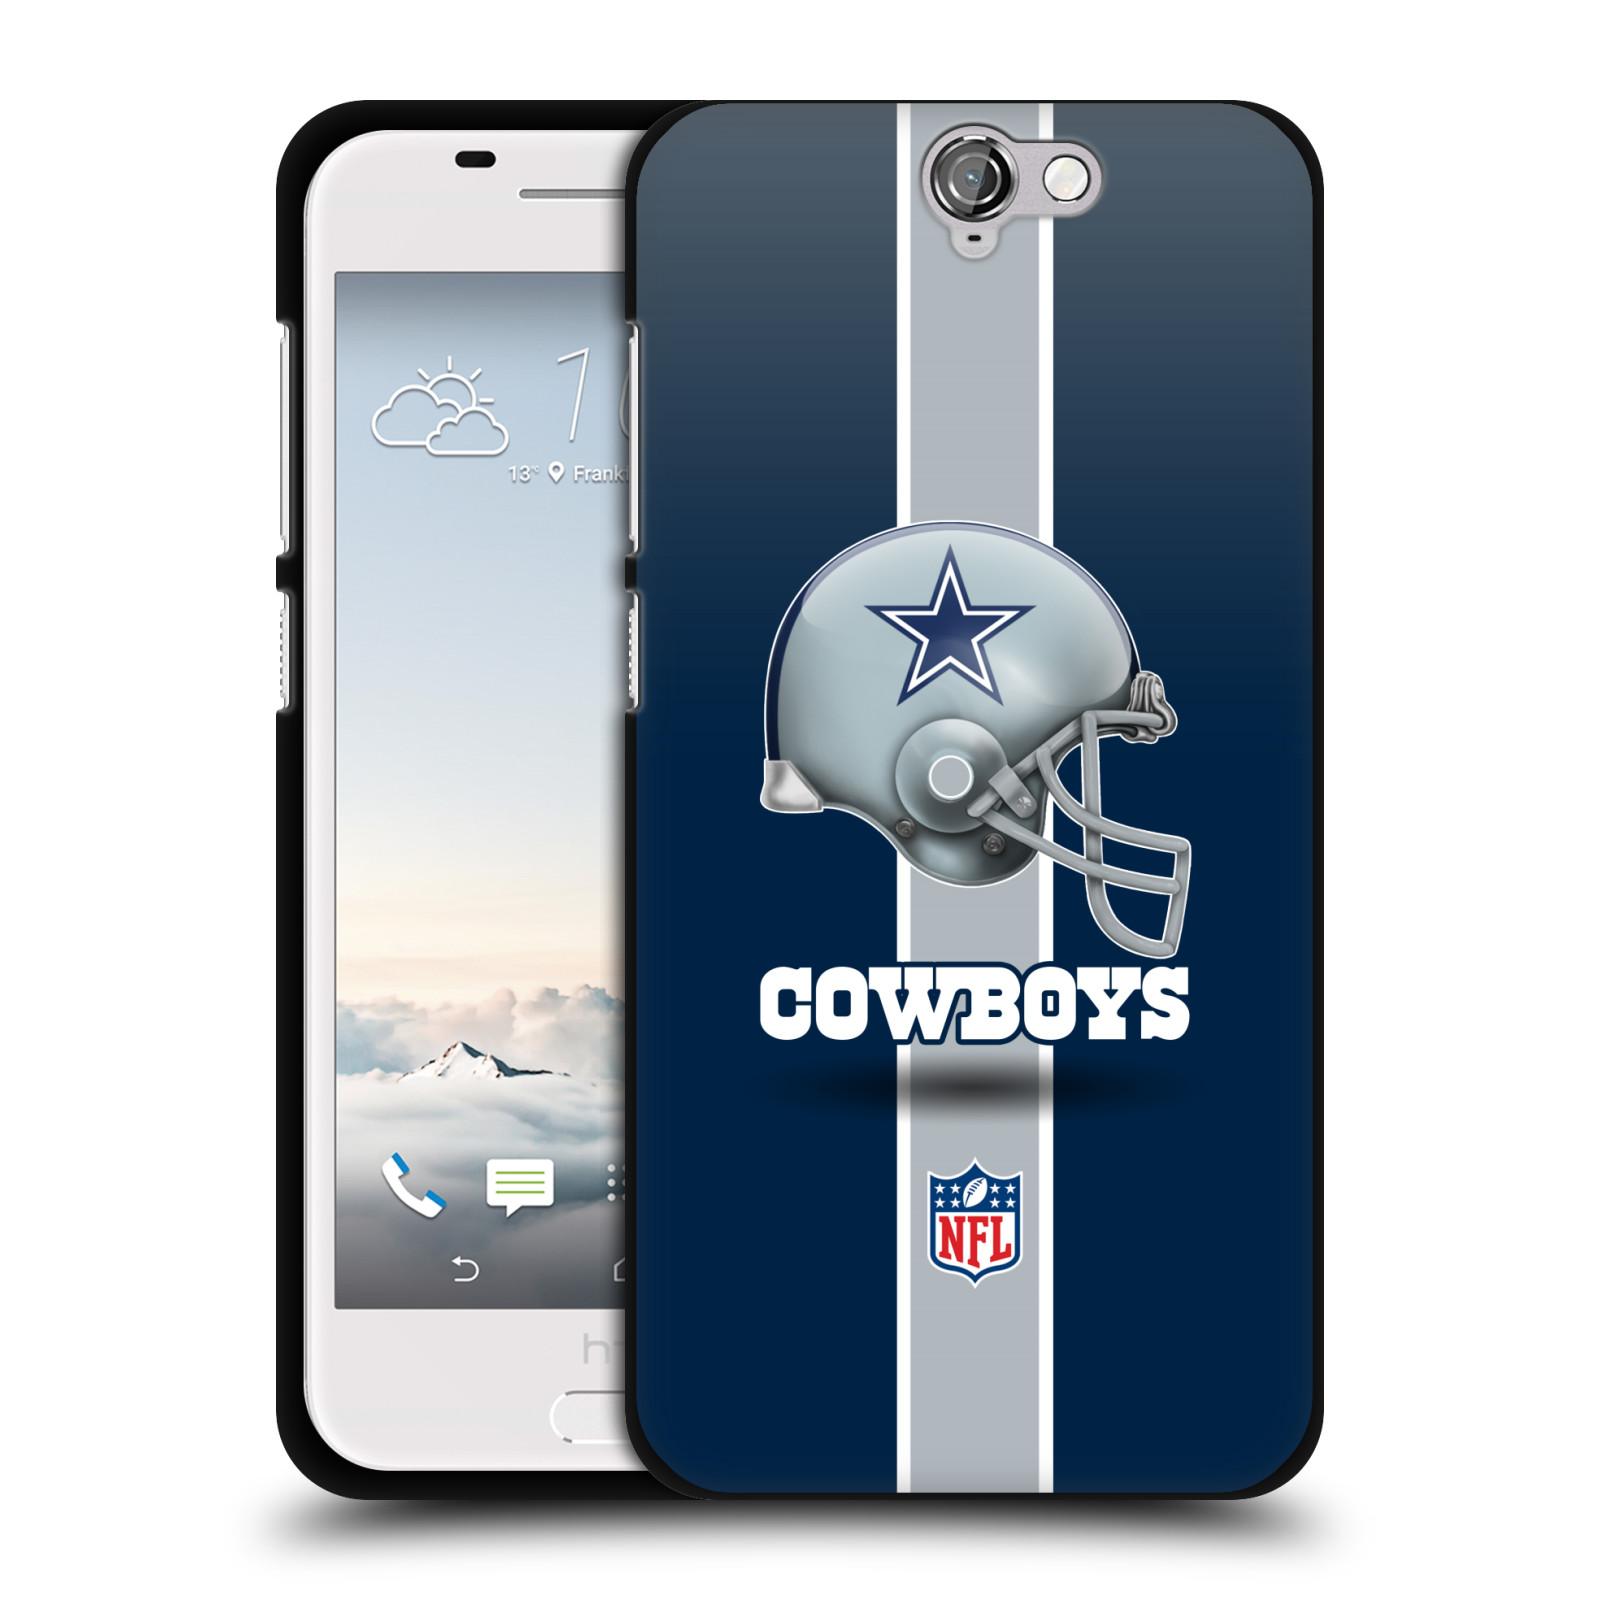 OFFICIAL-NFL-DALLAS-COWBOYS-LOGO-BLACK-SOFT-GEL-CASE-FOR-HTC-PHONES